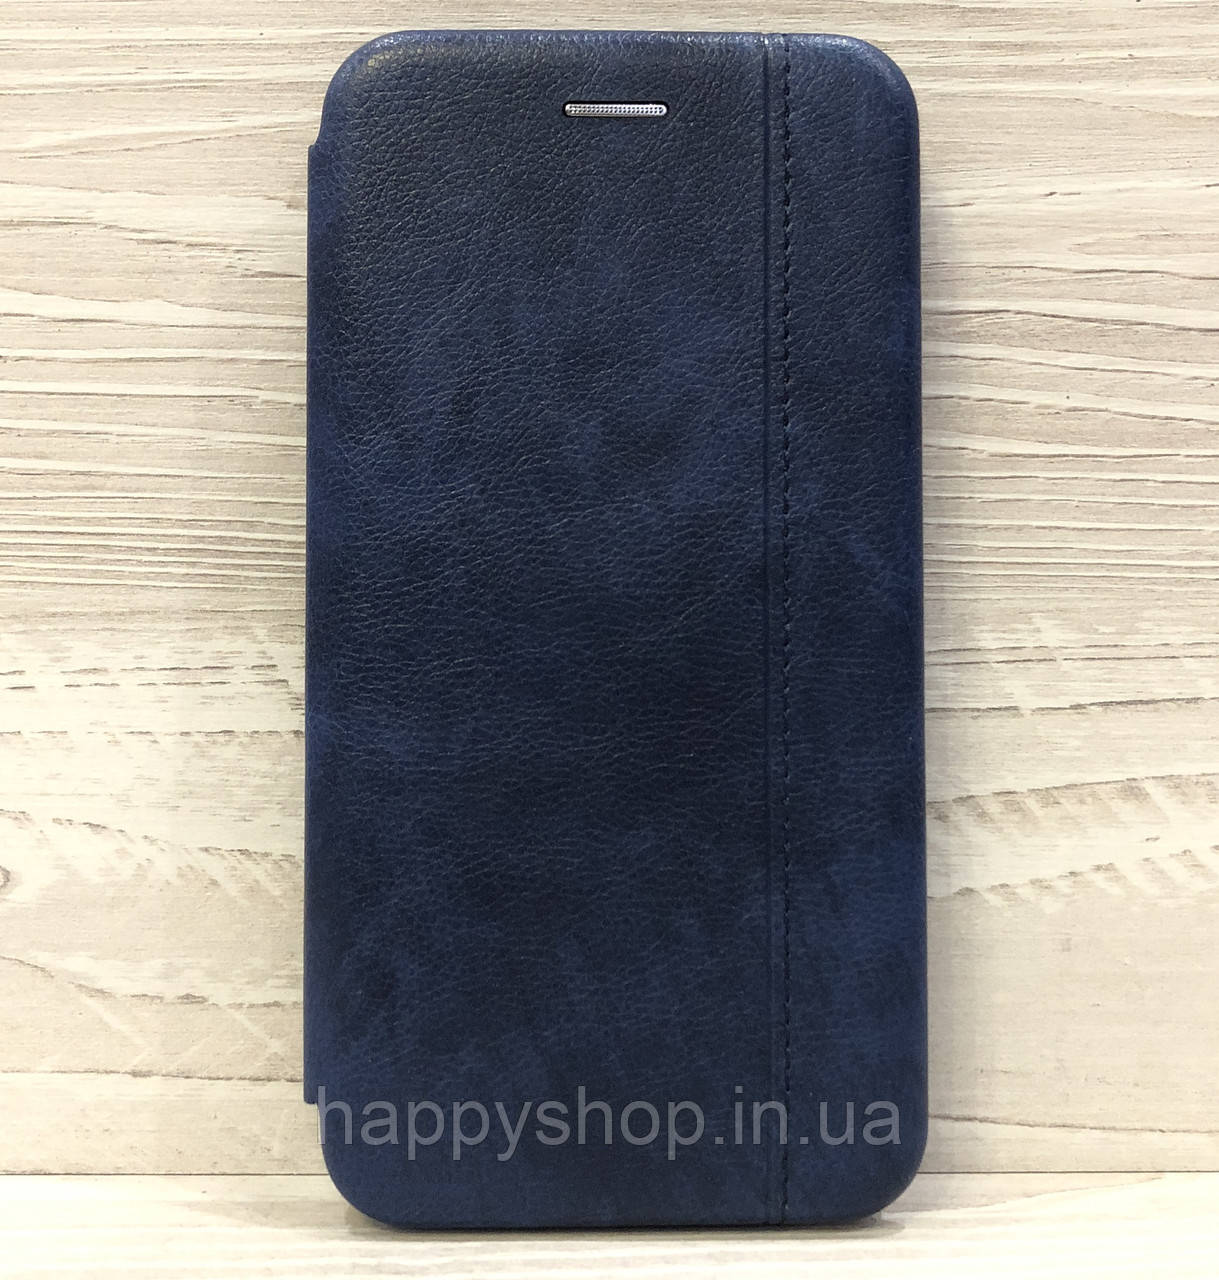 Чехол-книжка Gelius Leather для Samsung Galaxy A9 2018 (A920) Синий